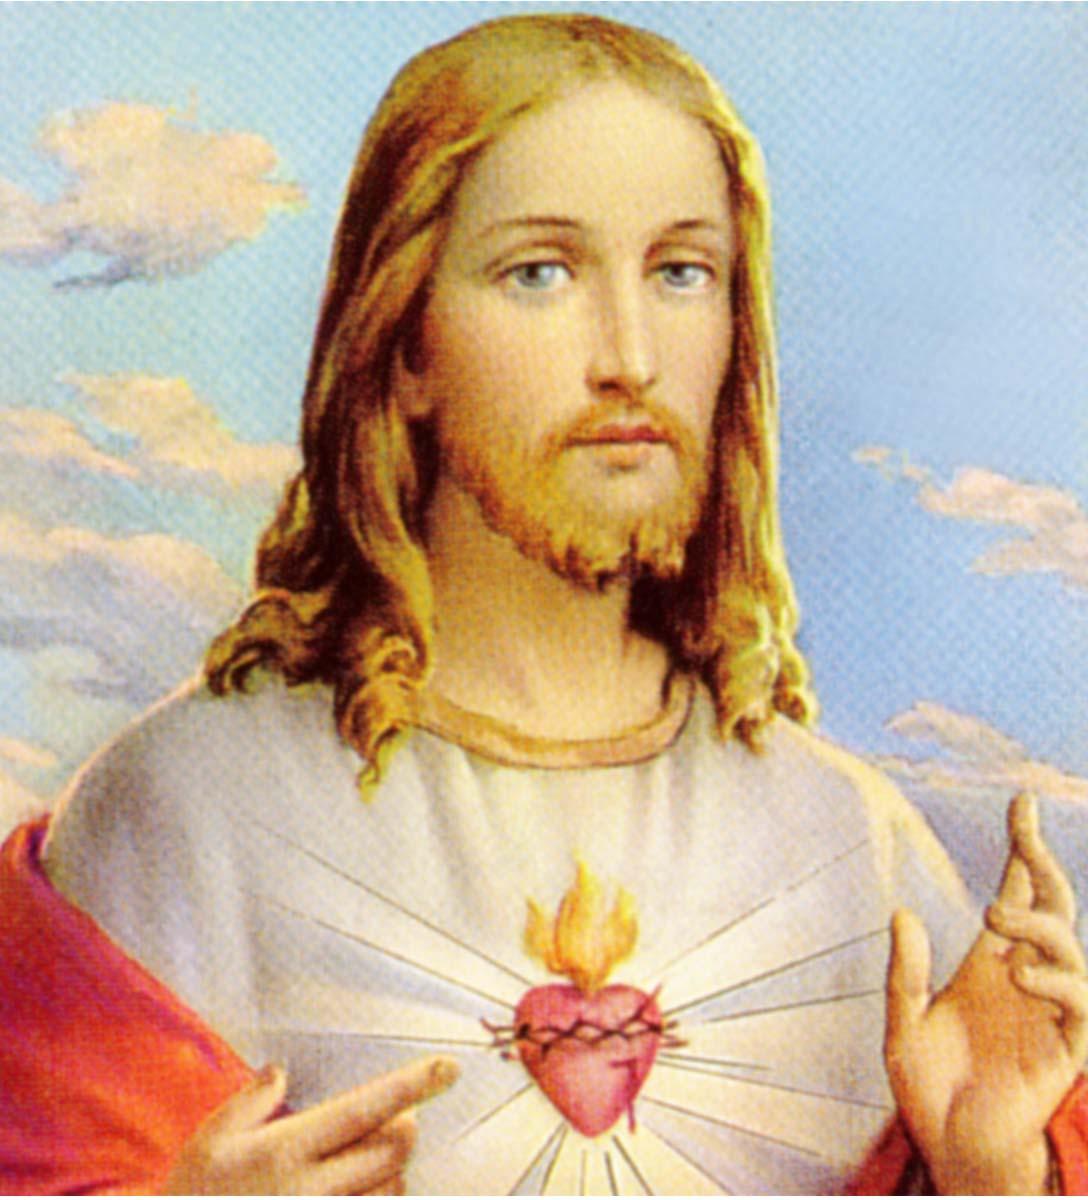 jesus-pictures-3.jpg